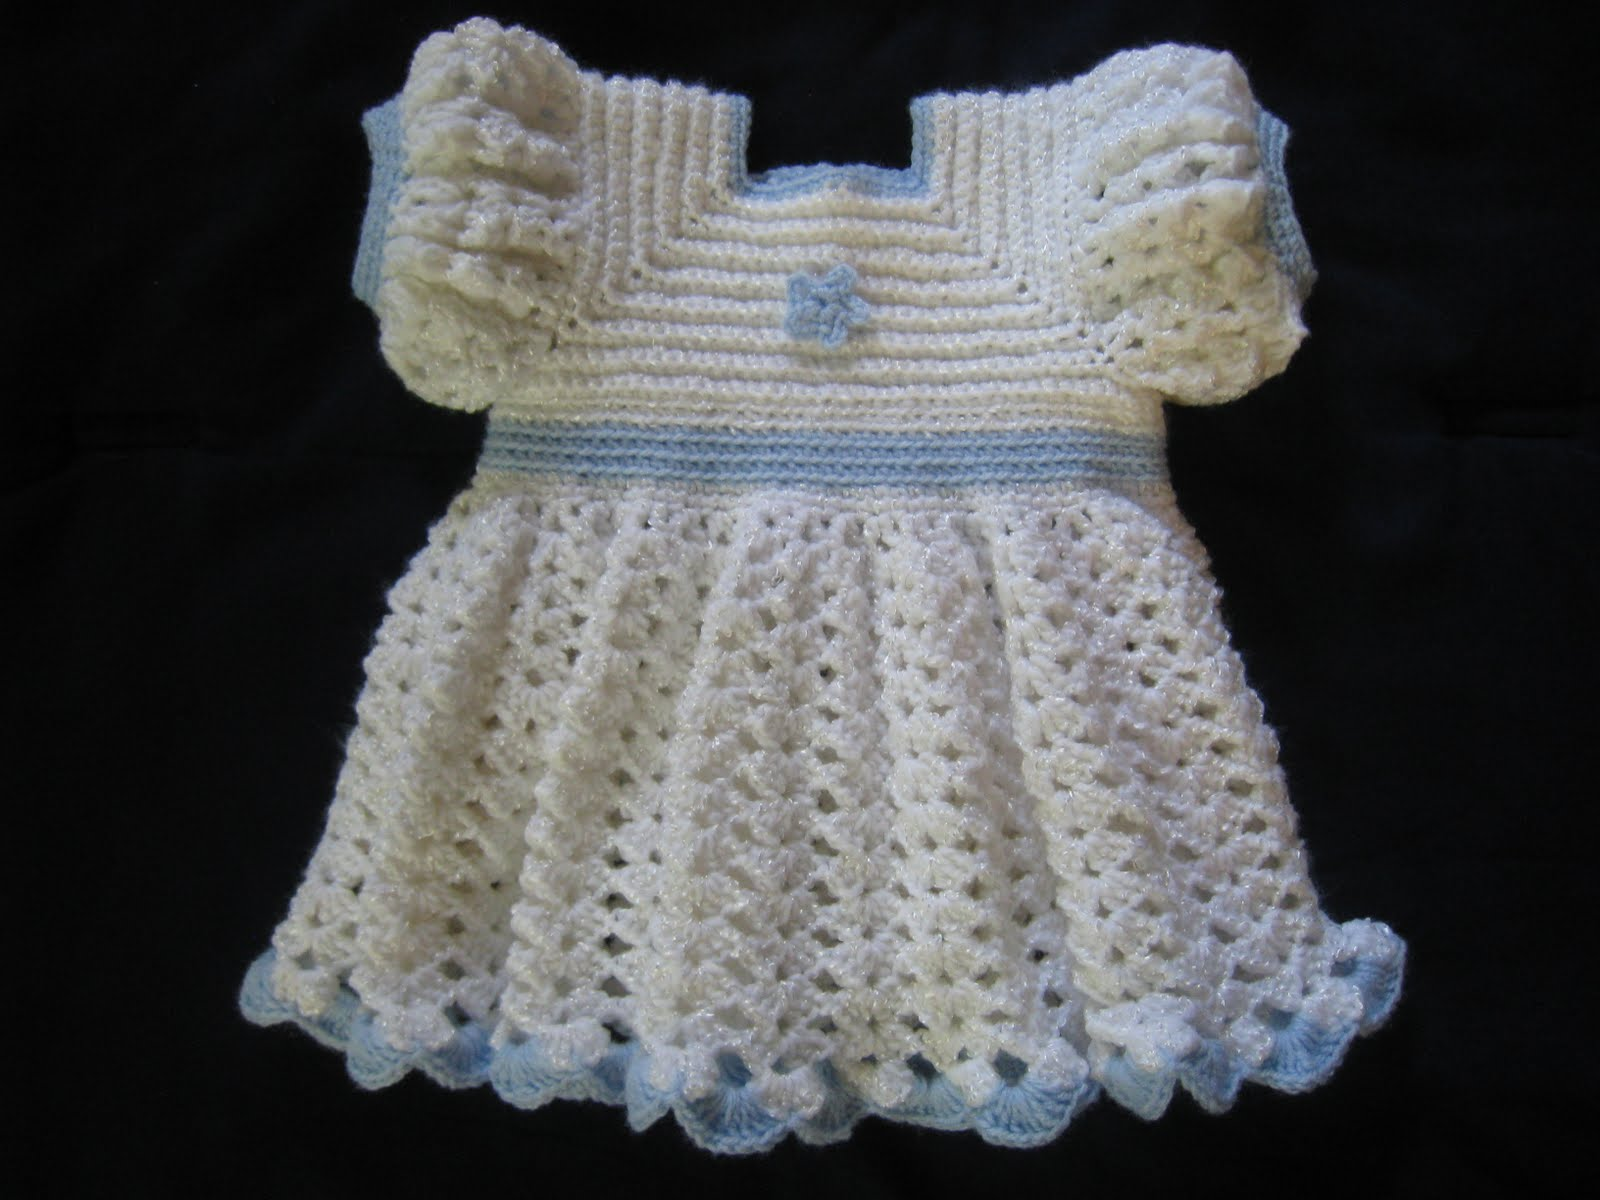 My creativity: A Ruffled Crocheted Baby Dress